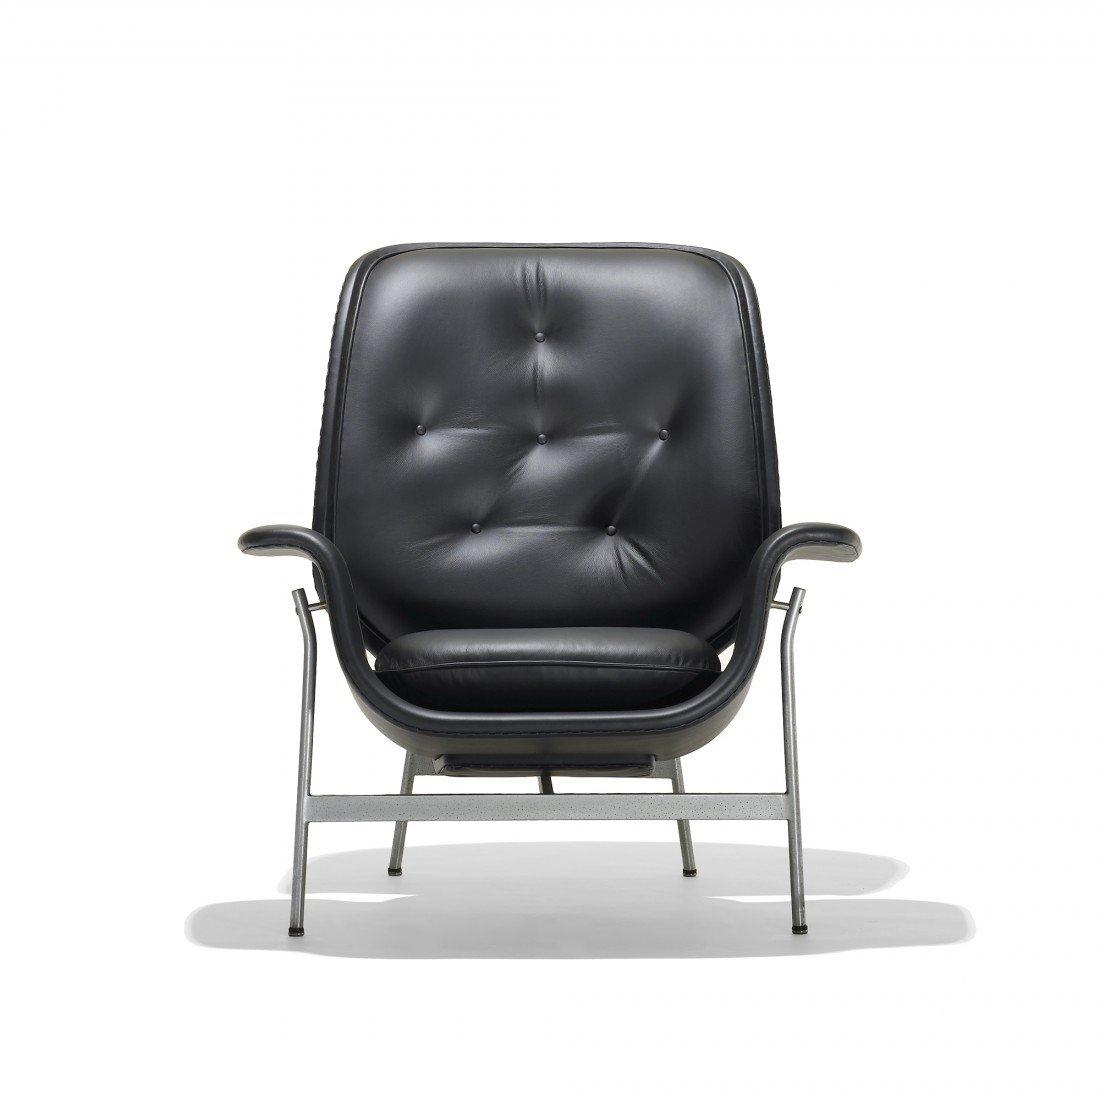 144: George Nelson & Associates Kangaroo chair